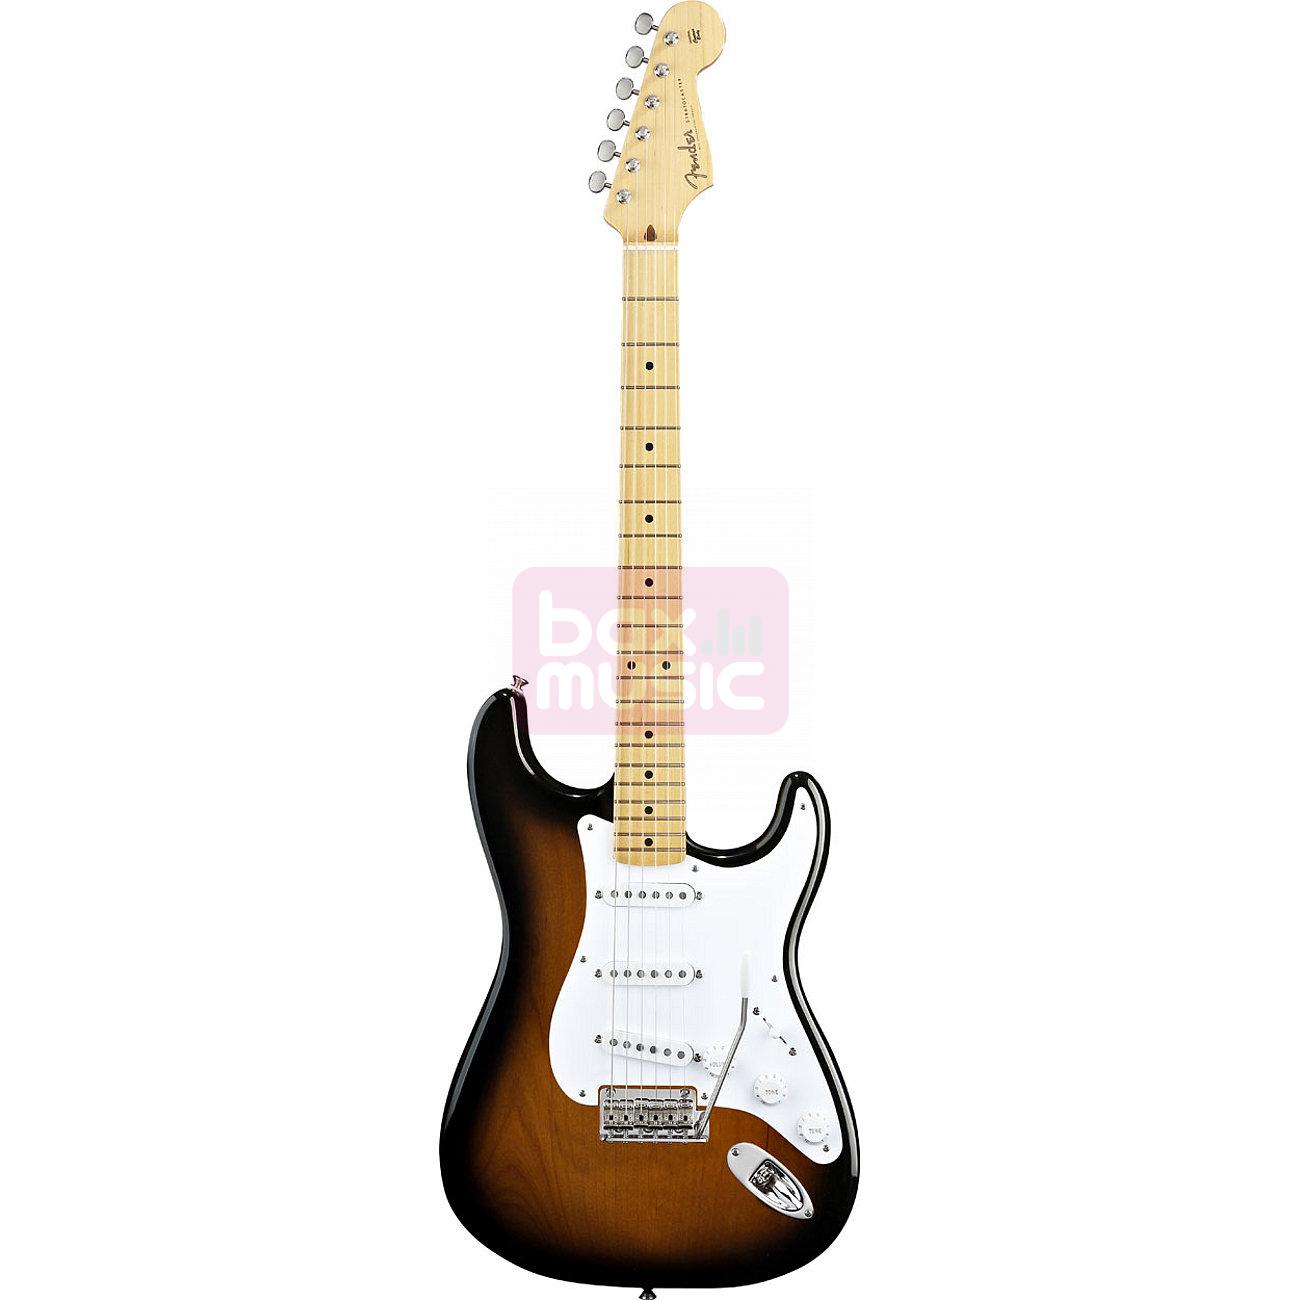 Fender Classic Player 50s Stratocaster 2-Color Sunburst MN